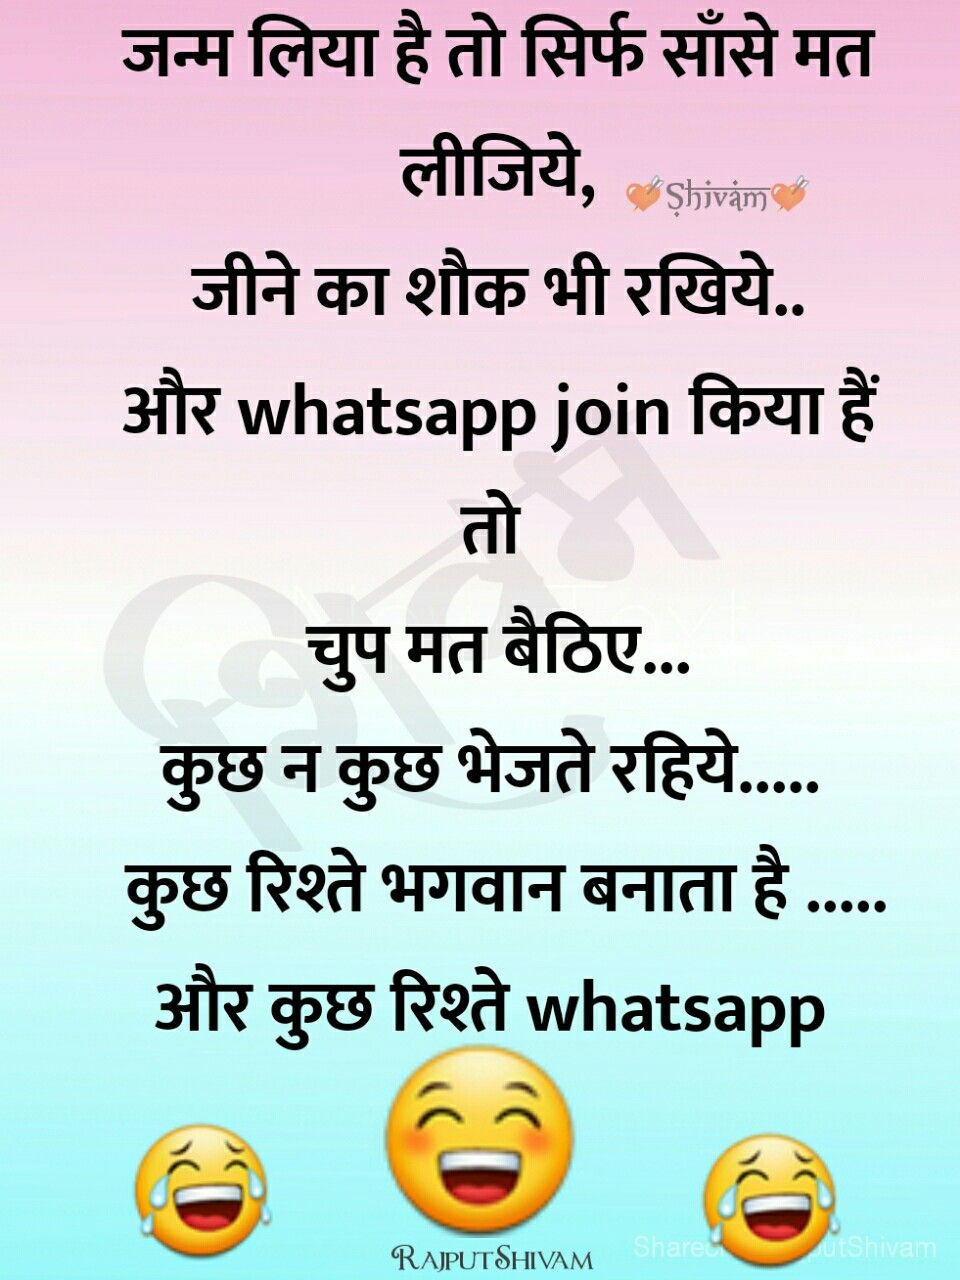 Pin By Raaftar Singh On Feb 2019 Some Funny Jokes Very Funny Jokes Funny Jokes In Hindi